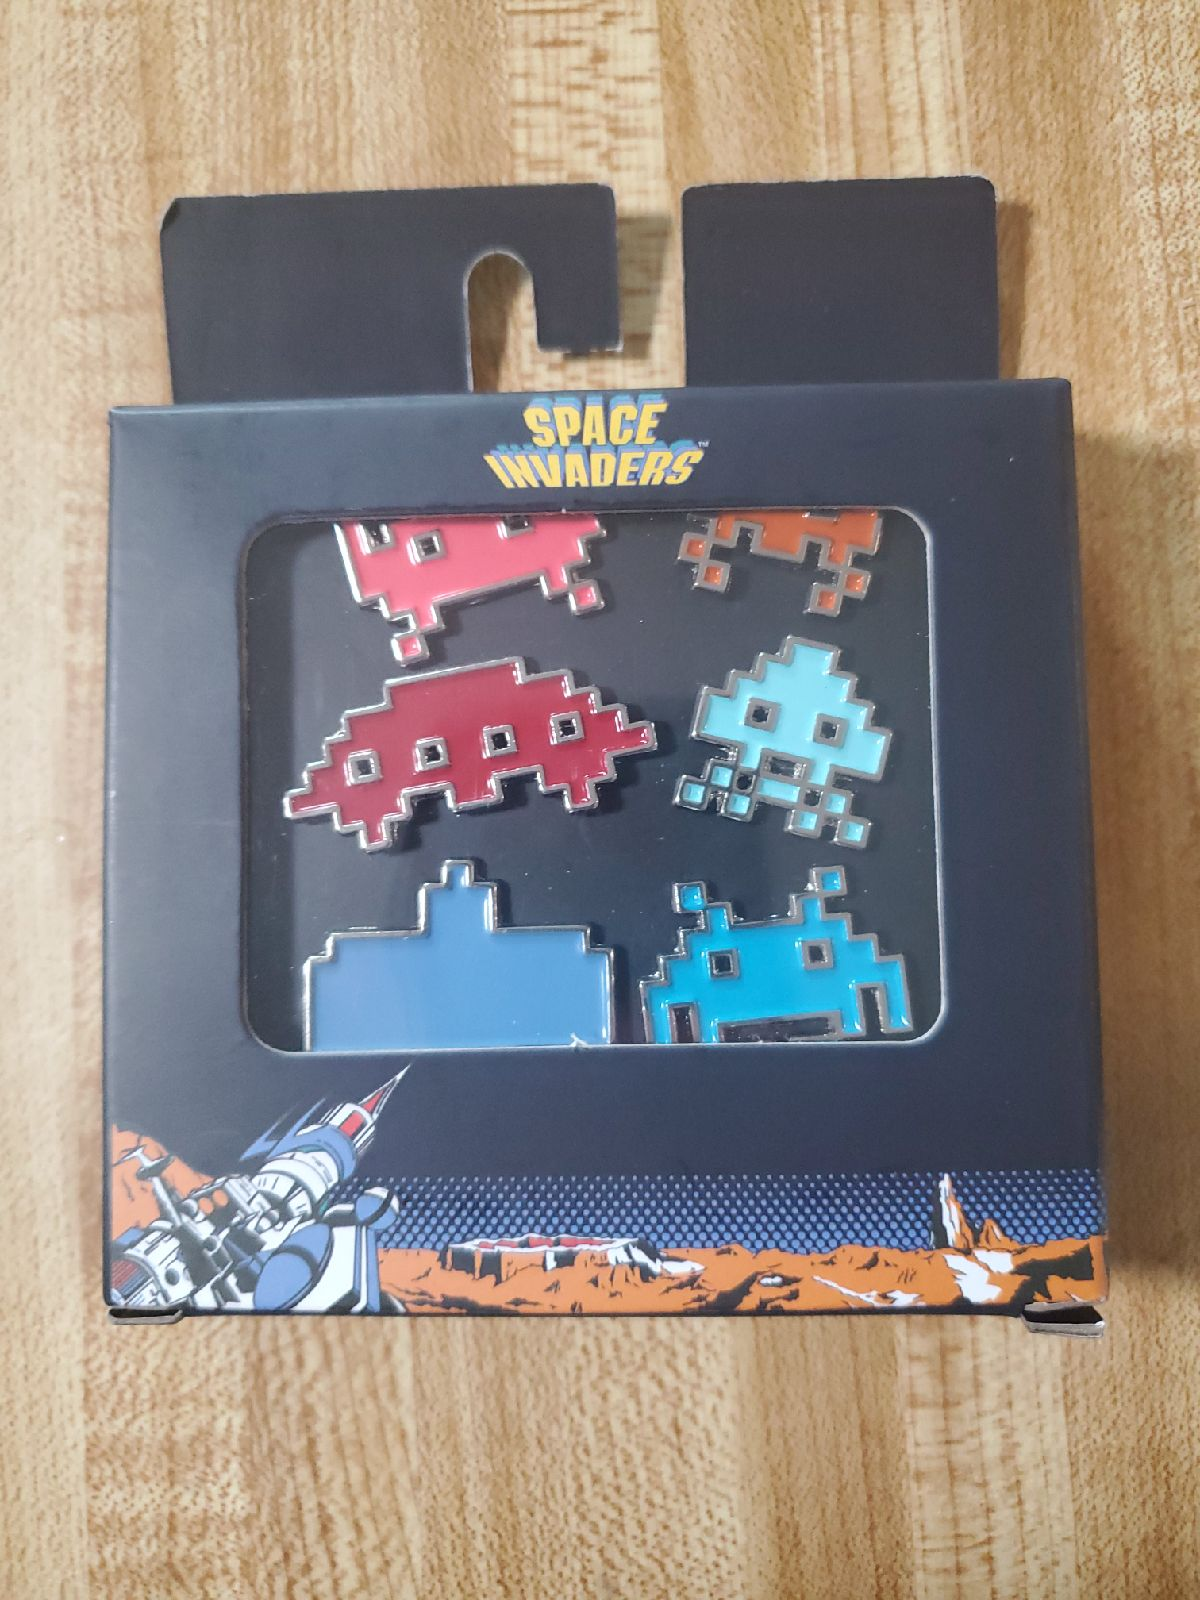 Space Invaders Pins